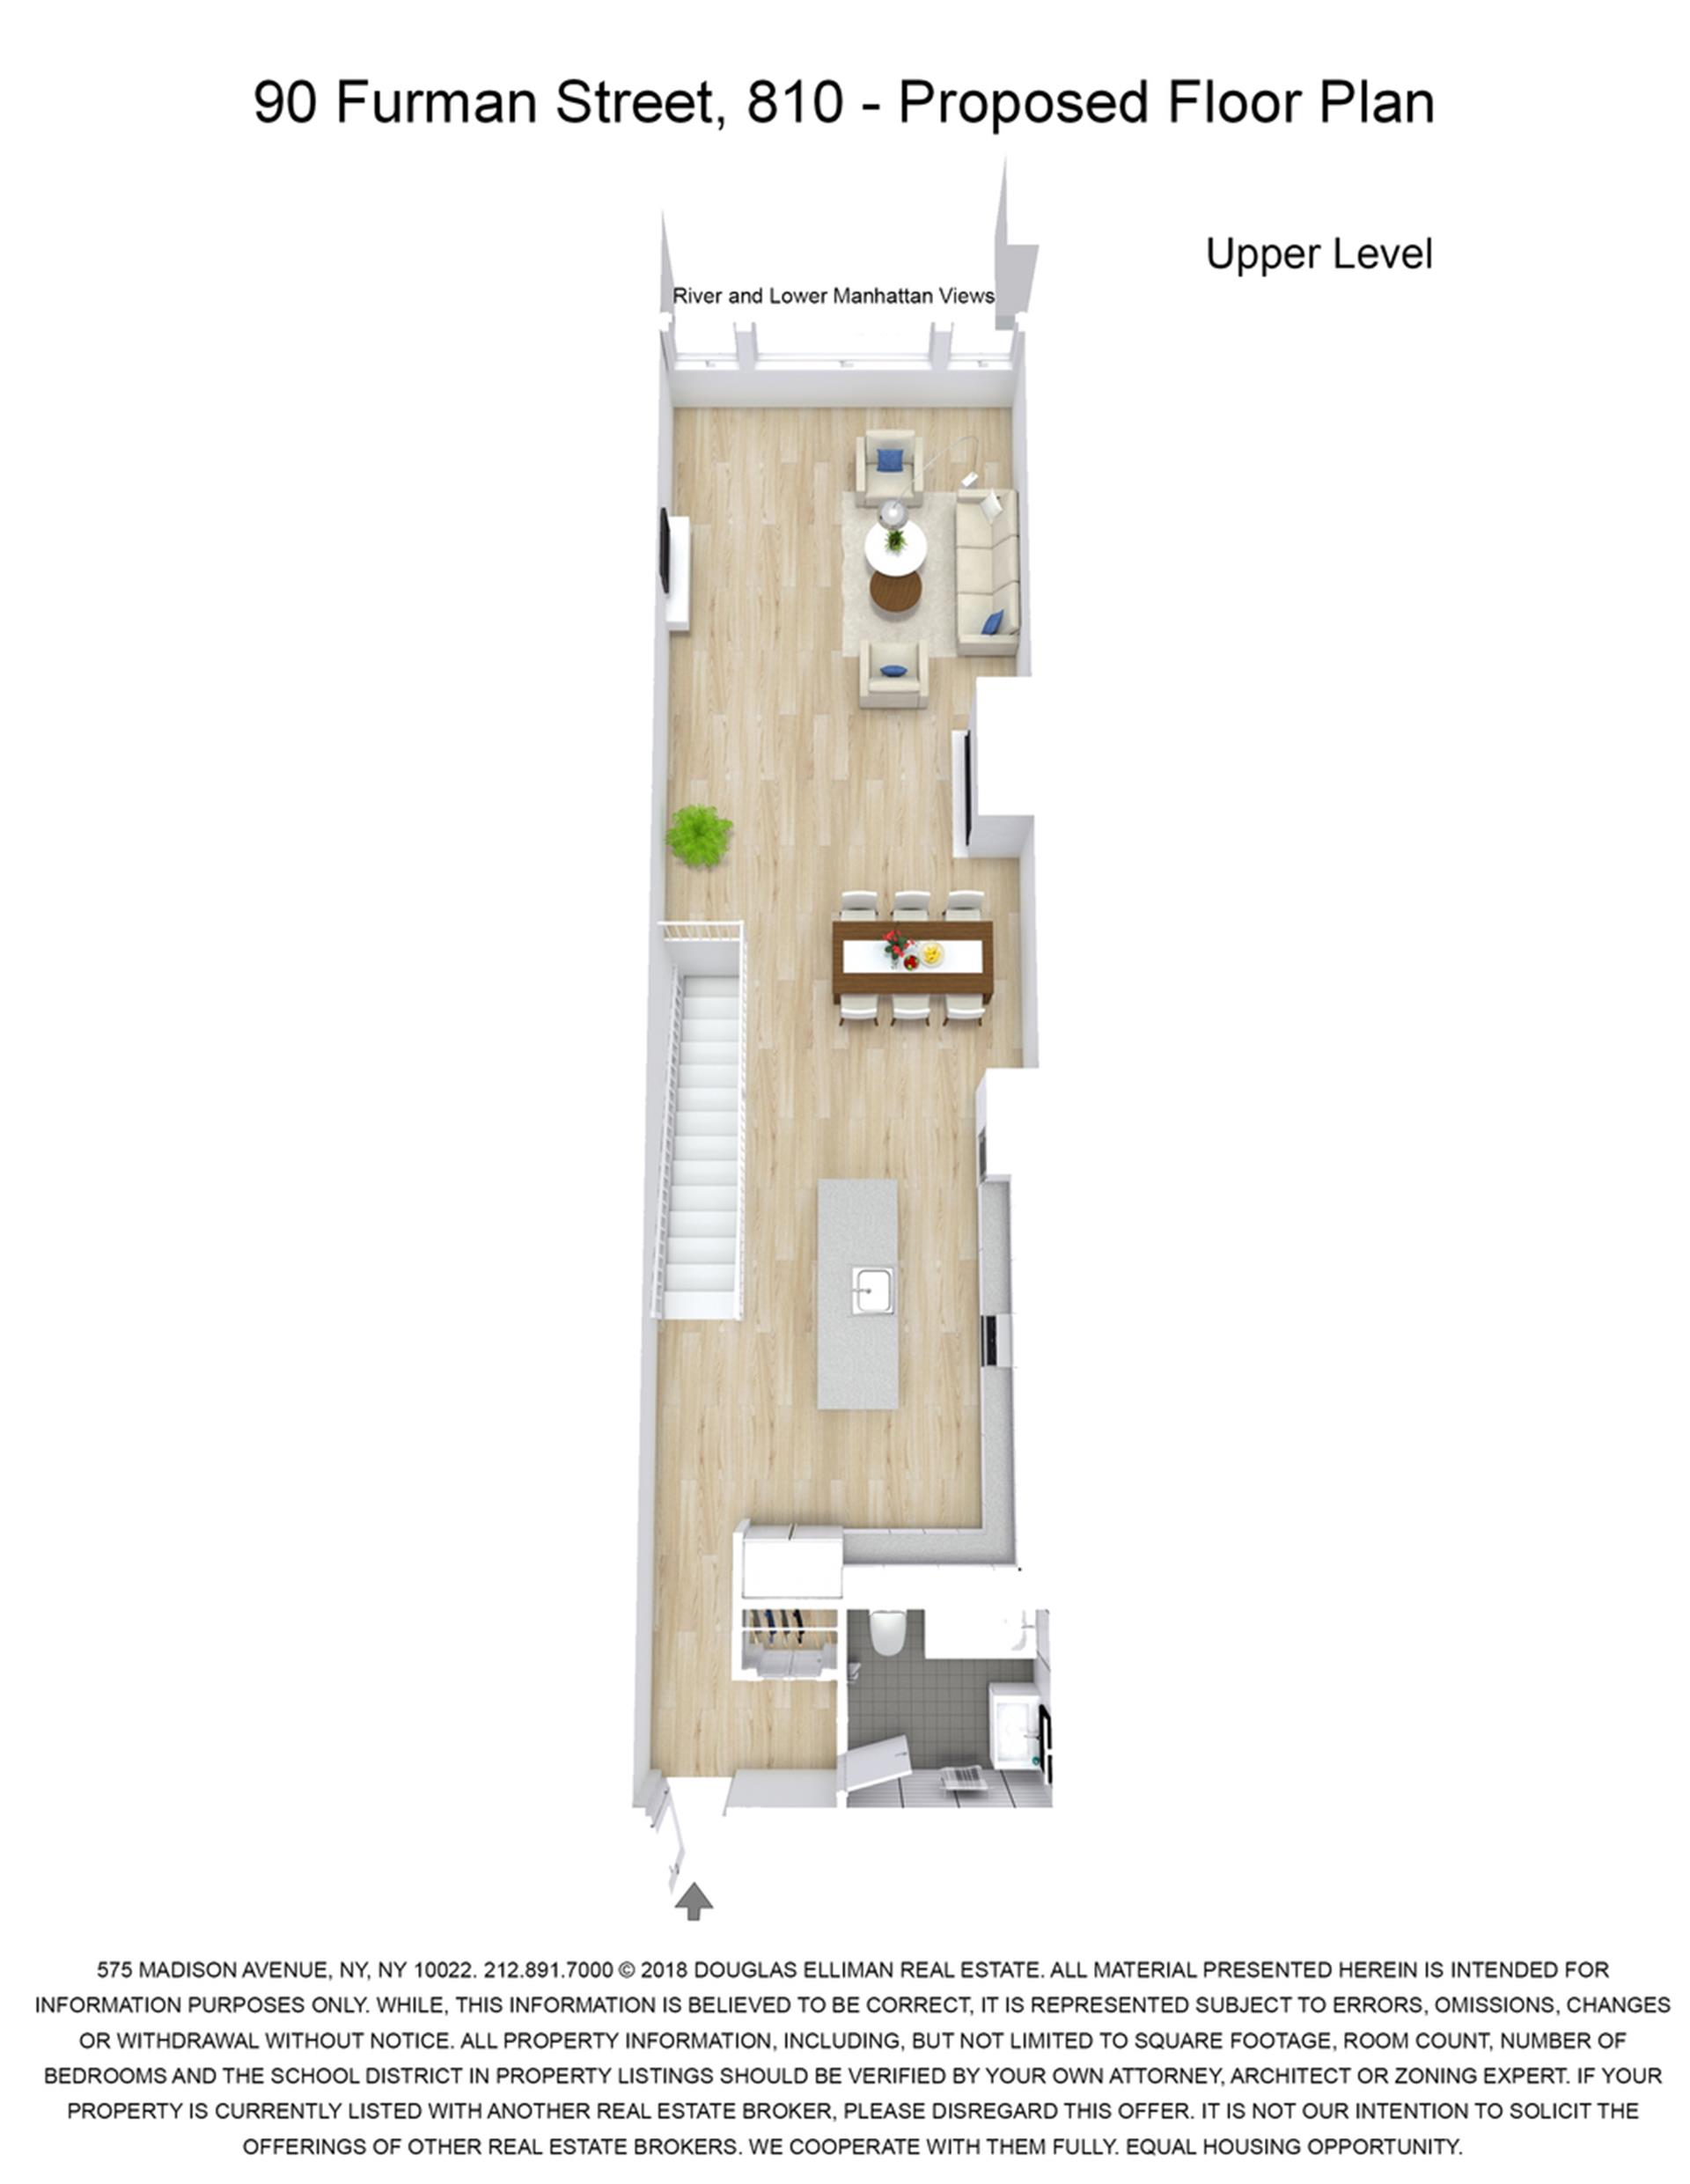 Floor plan of Pierhouse at Brooklyn Bridge, 90 Furman St, N810 - Brooklyn Heights, New York